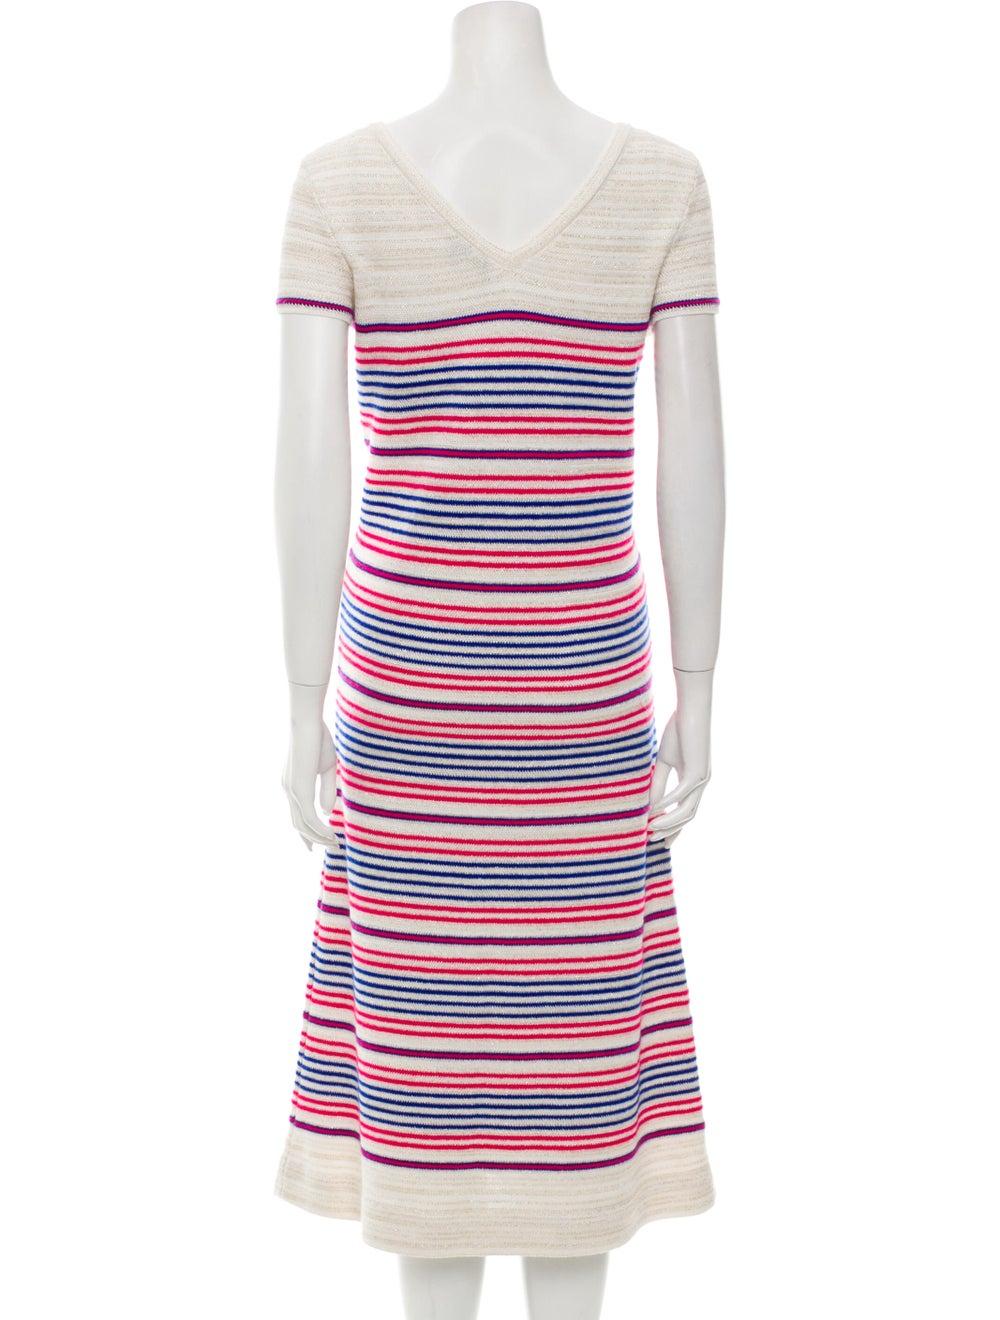 Chanel 2019 Midi Length Dress - image 3